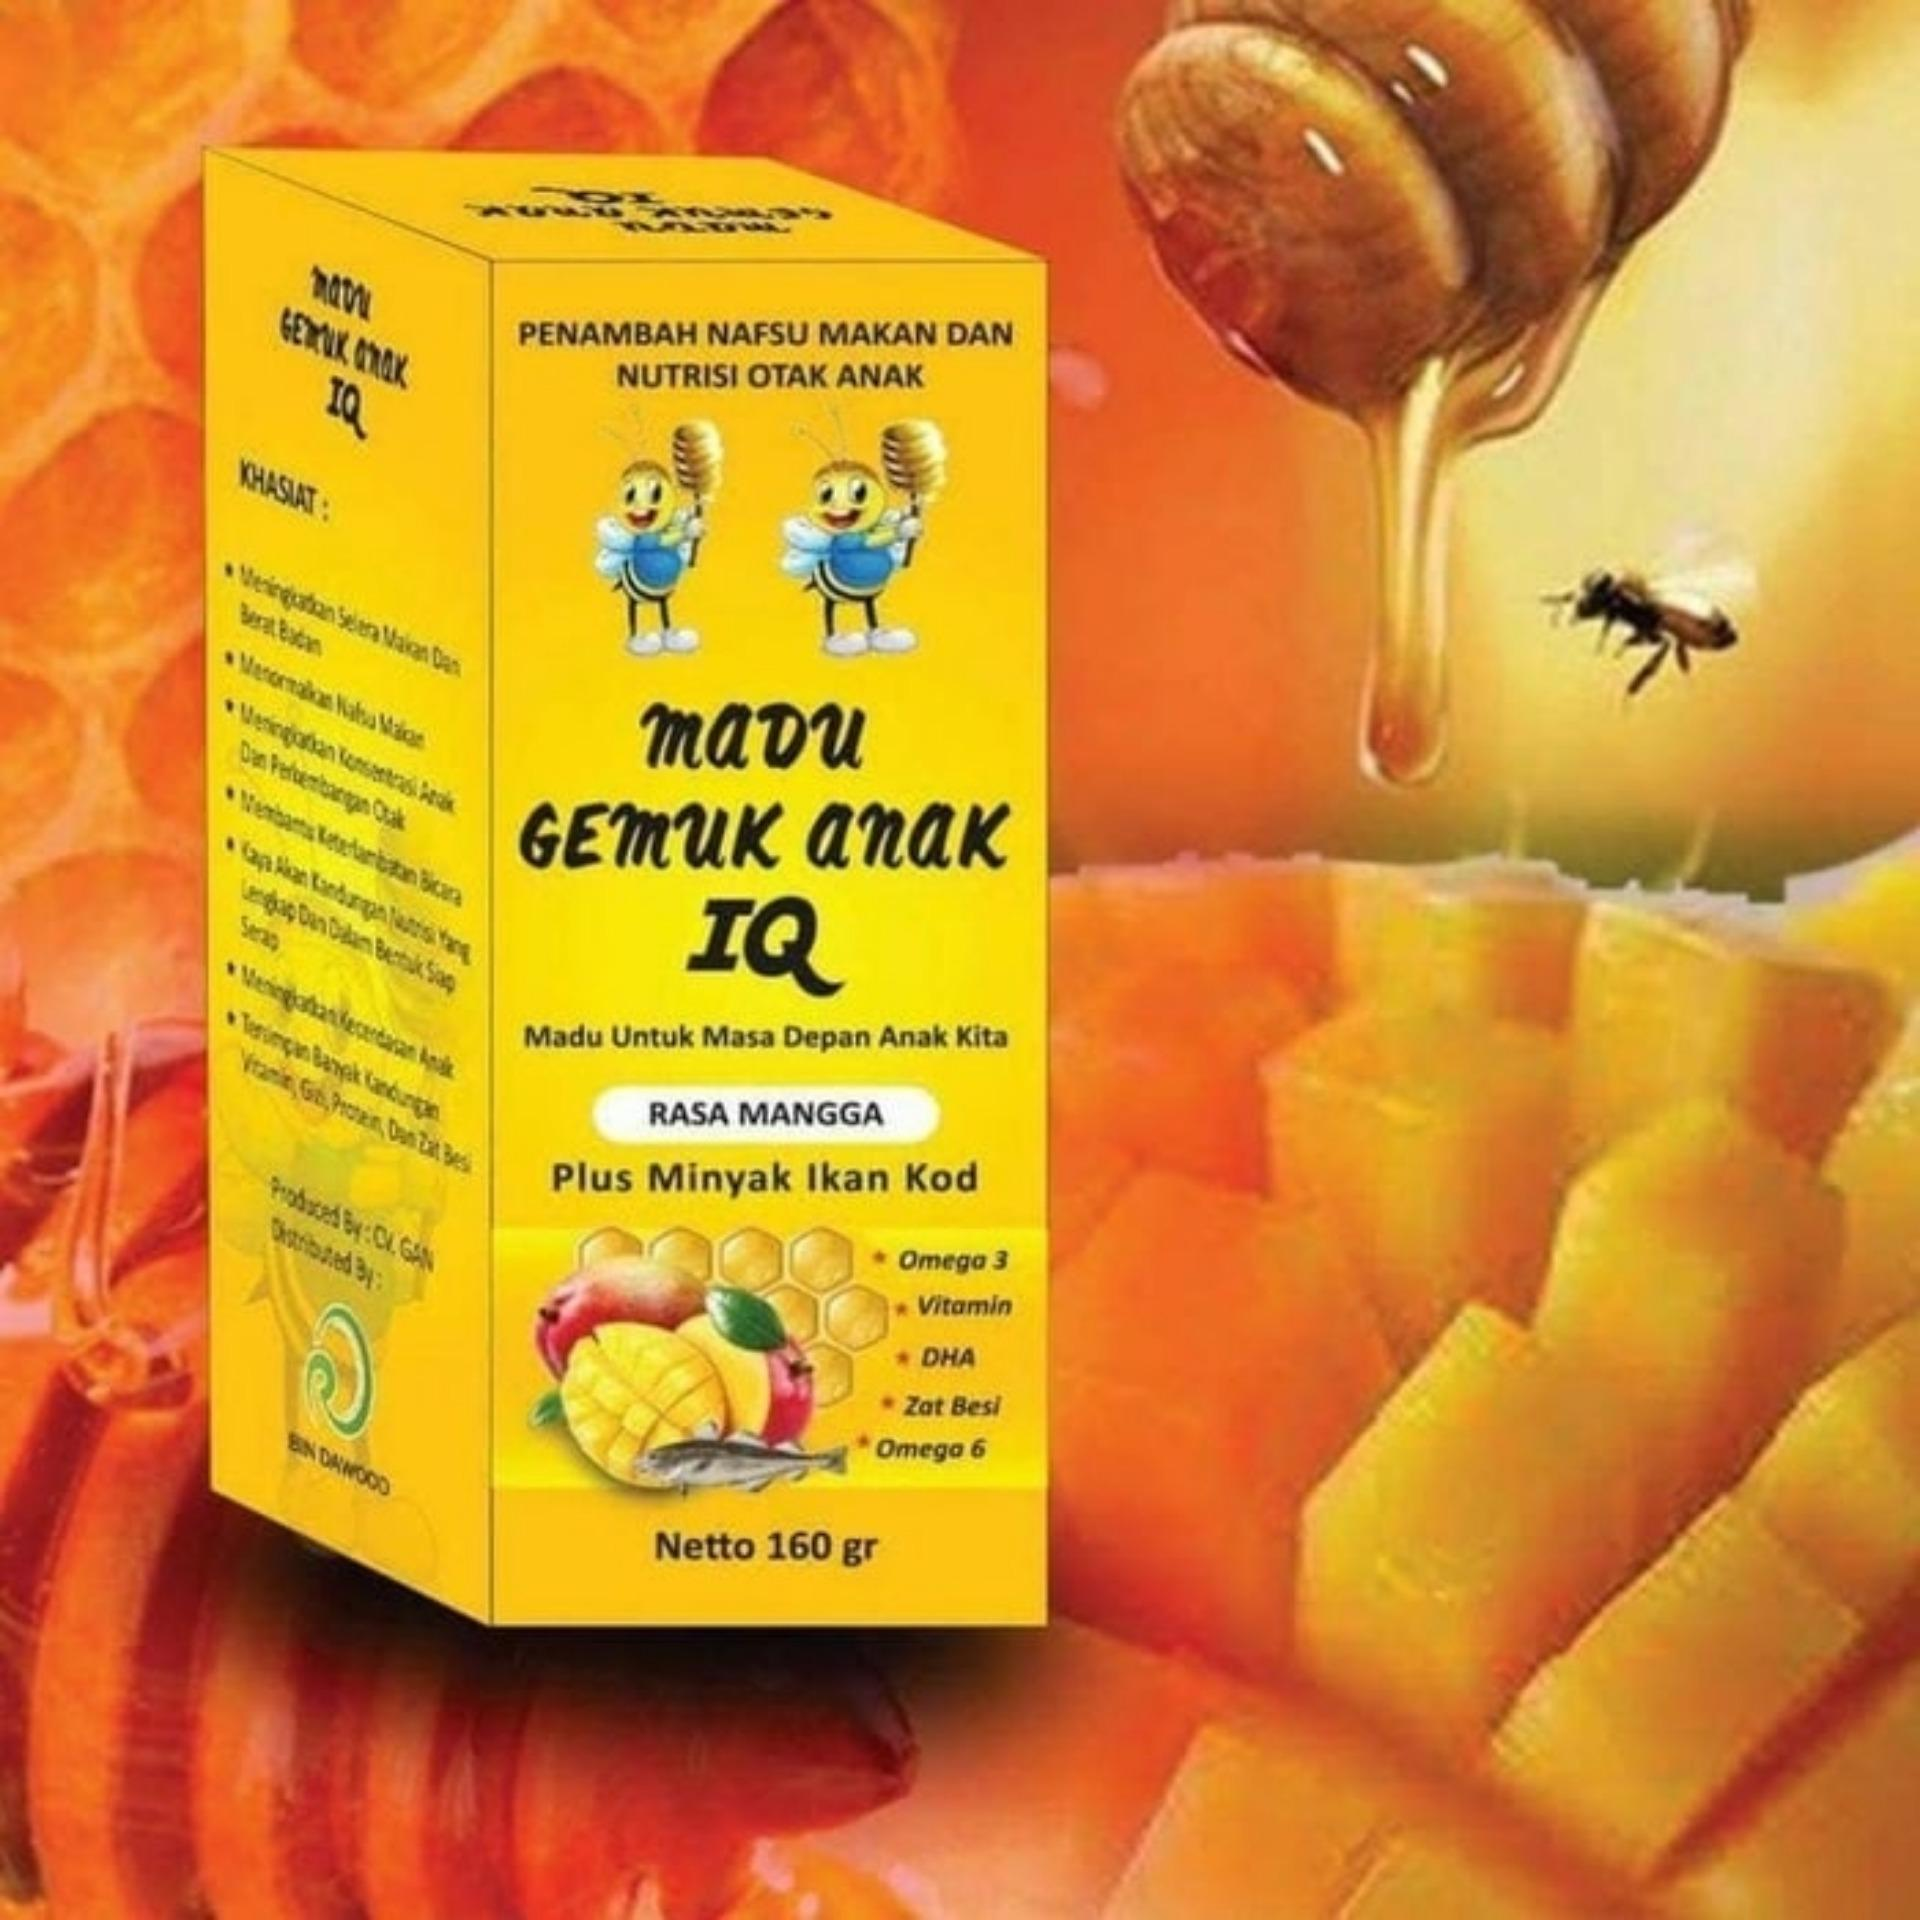 ... 200g Source HWI Mr Pro Madu Murni Propolis Penambah Nafsu Makan Penggemuk